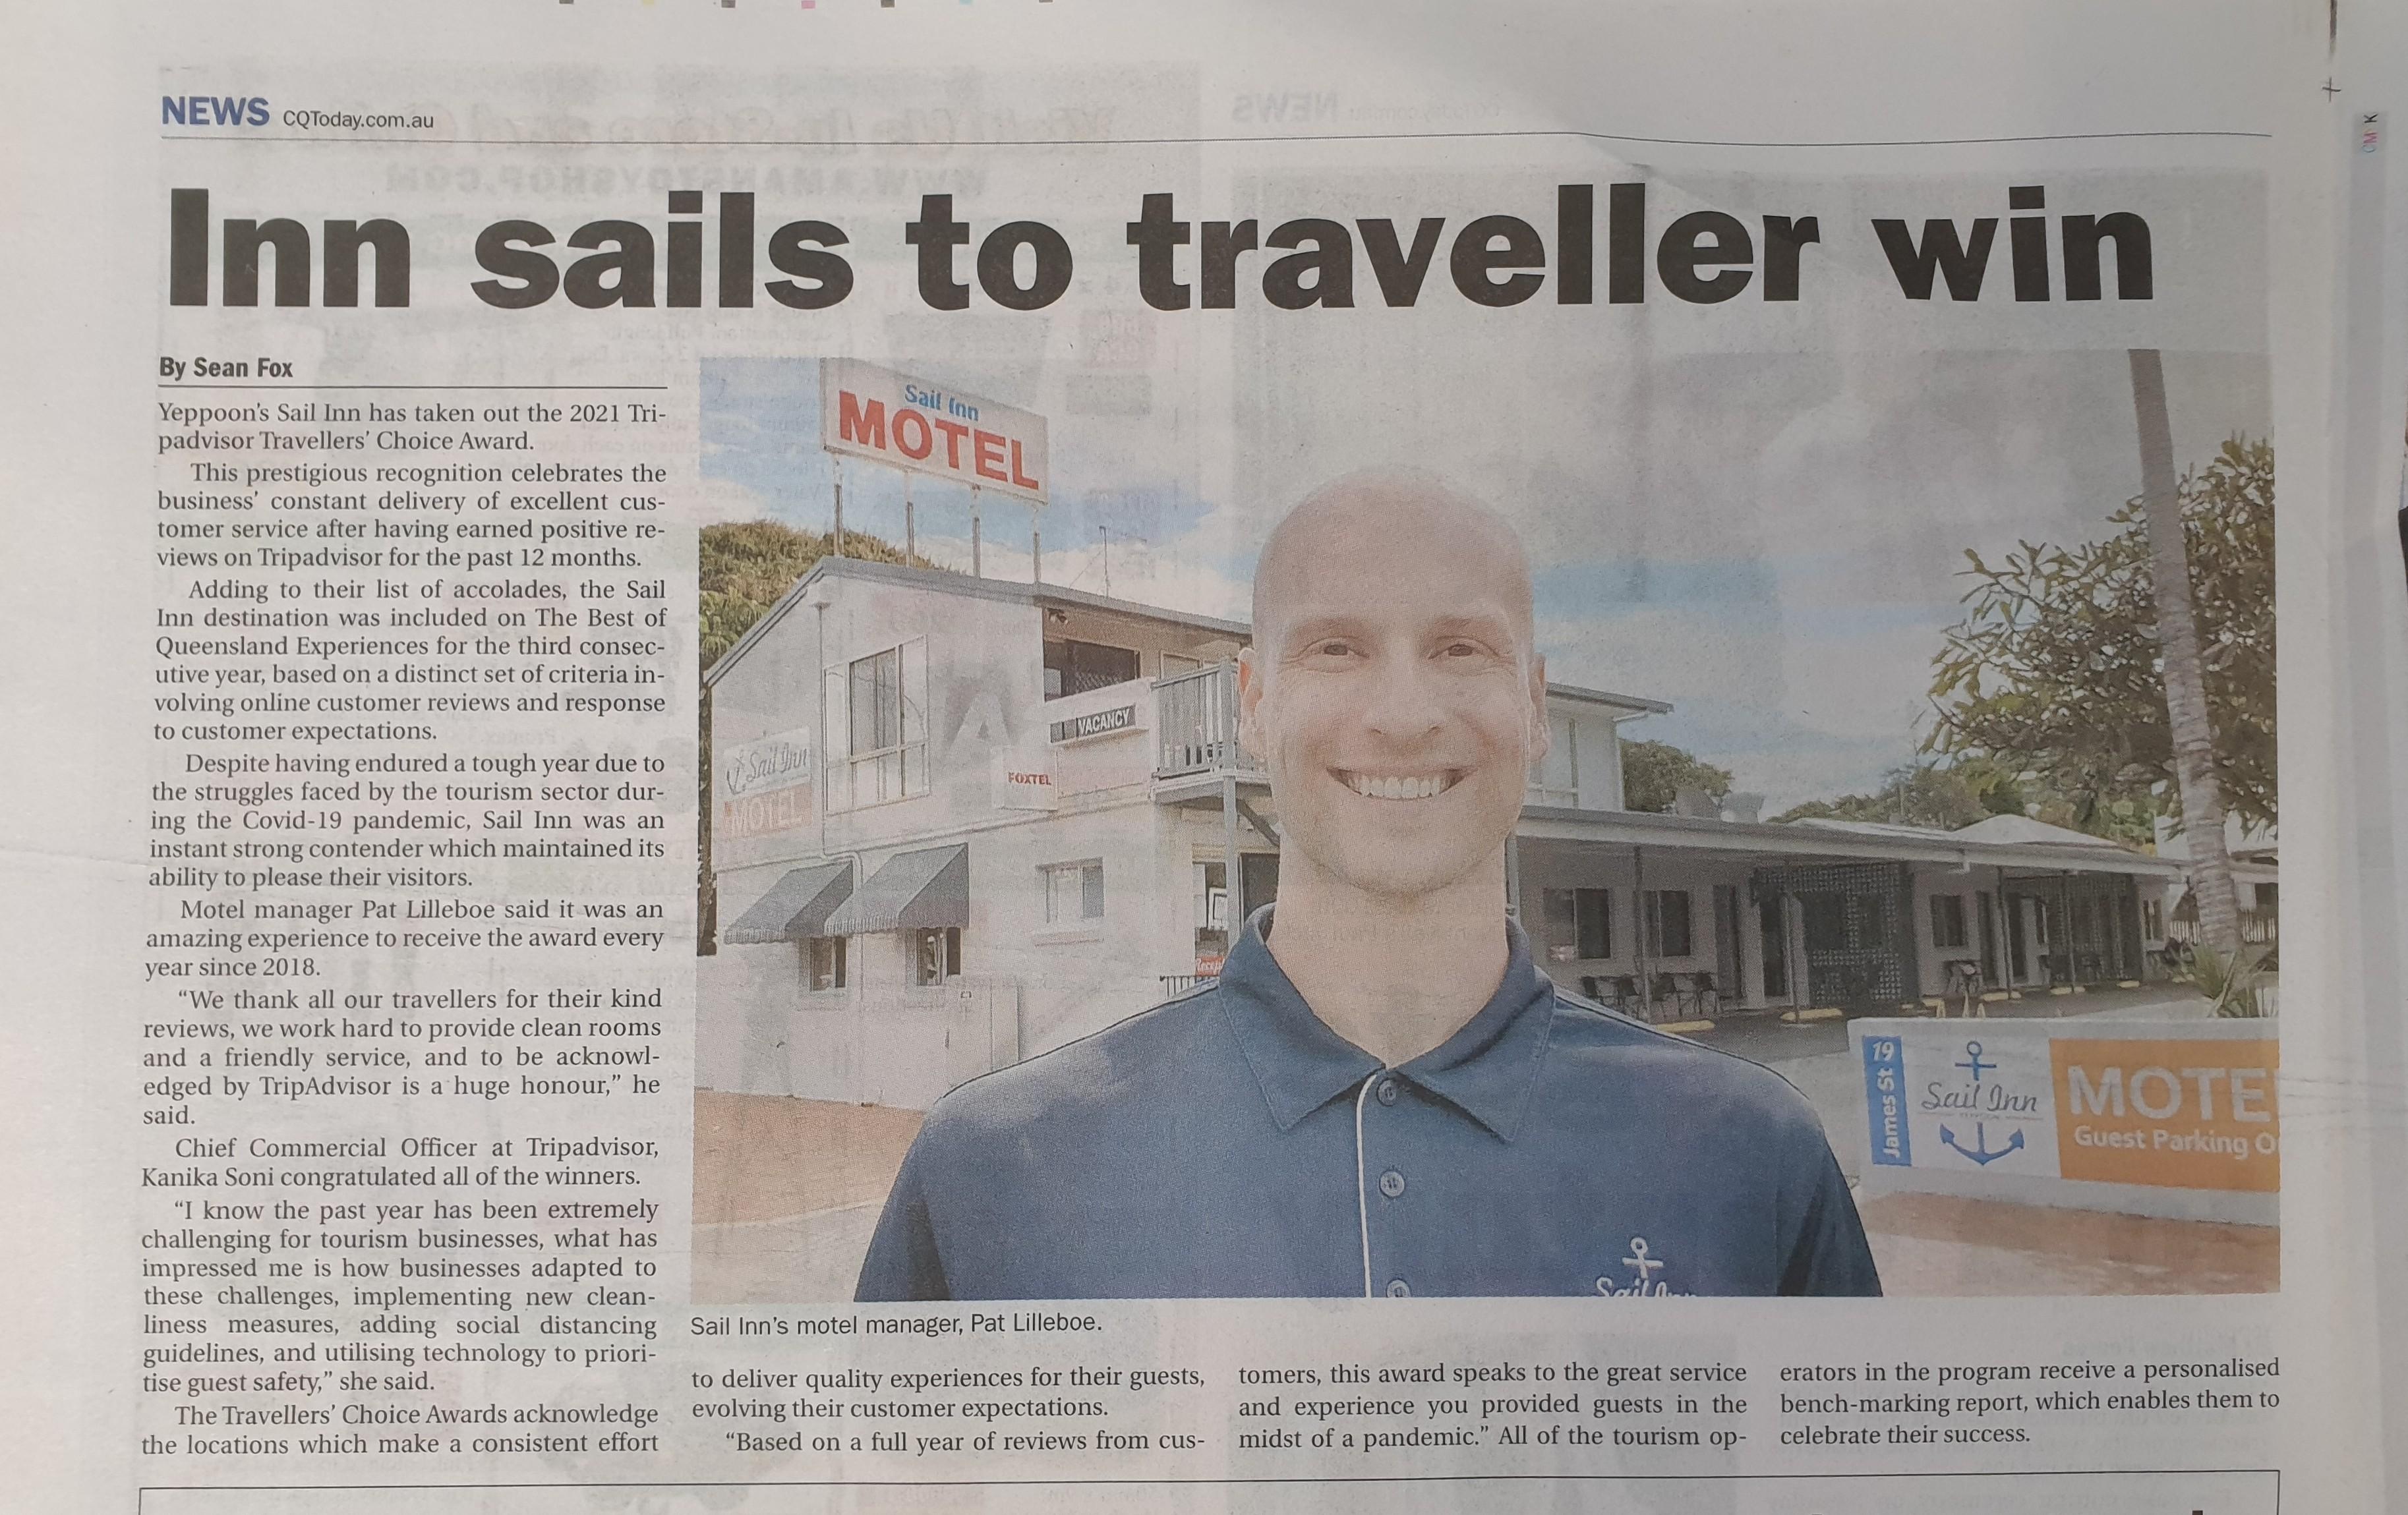 https://www.sailinn.com.au/wp-content/uploads/2021/06/20210729_154039.jpg